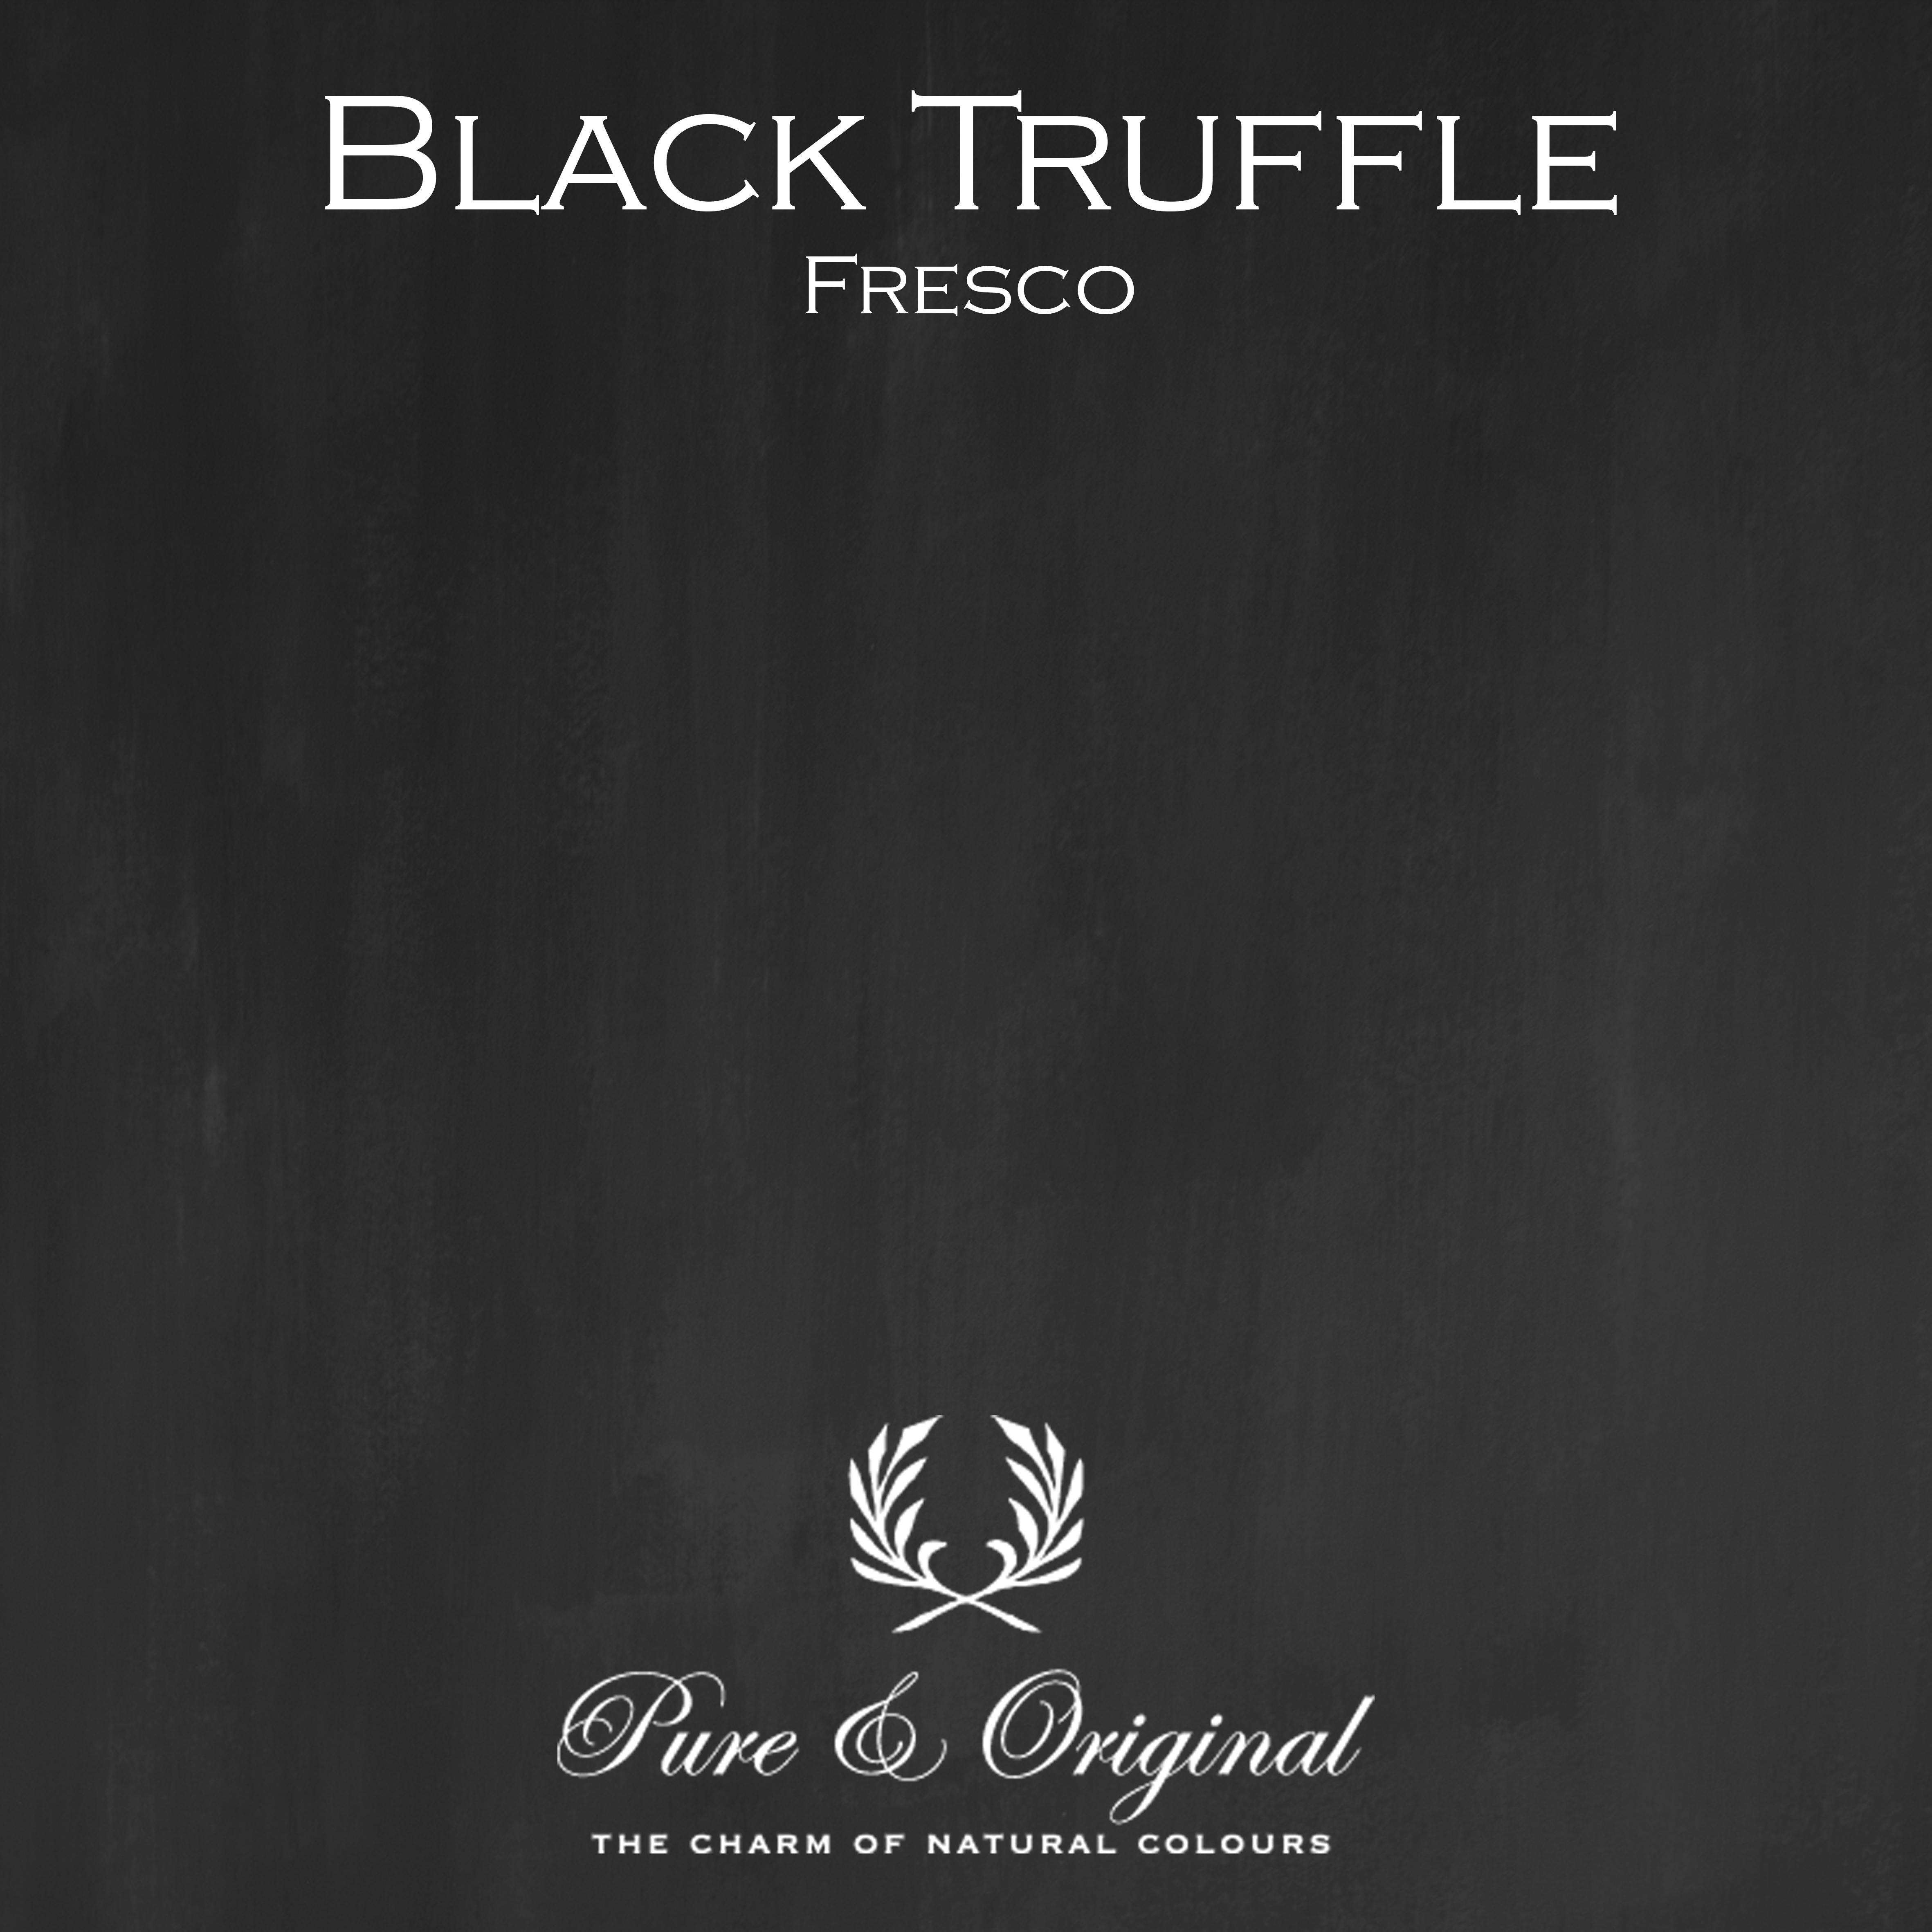 Kulör Black Truffle, Fresco kalkfärg